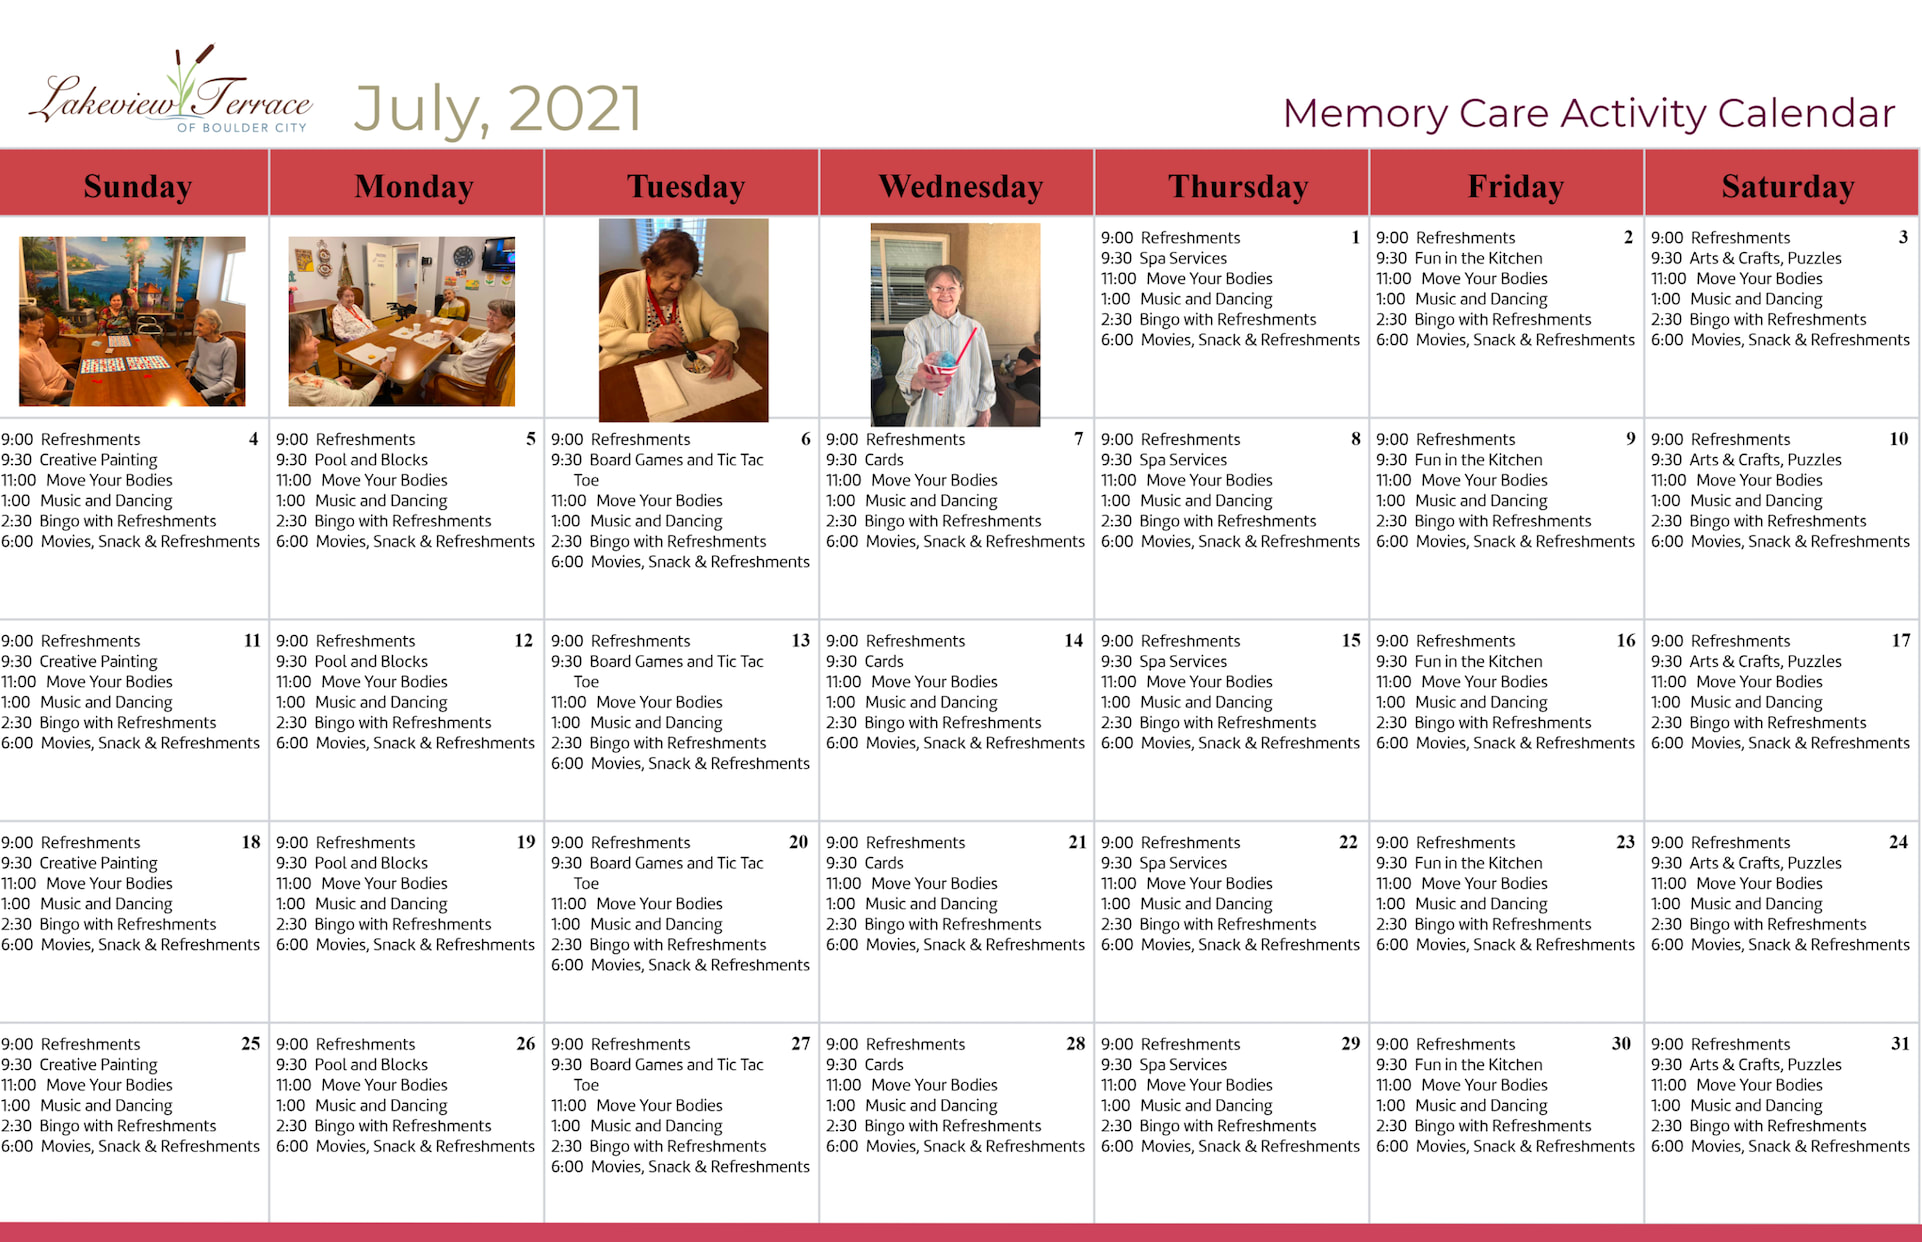 July 2021 Memory Care Calendar